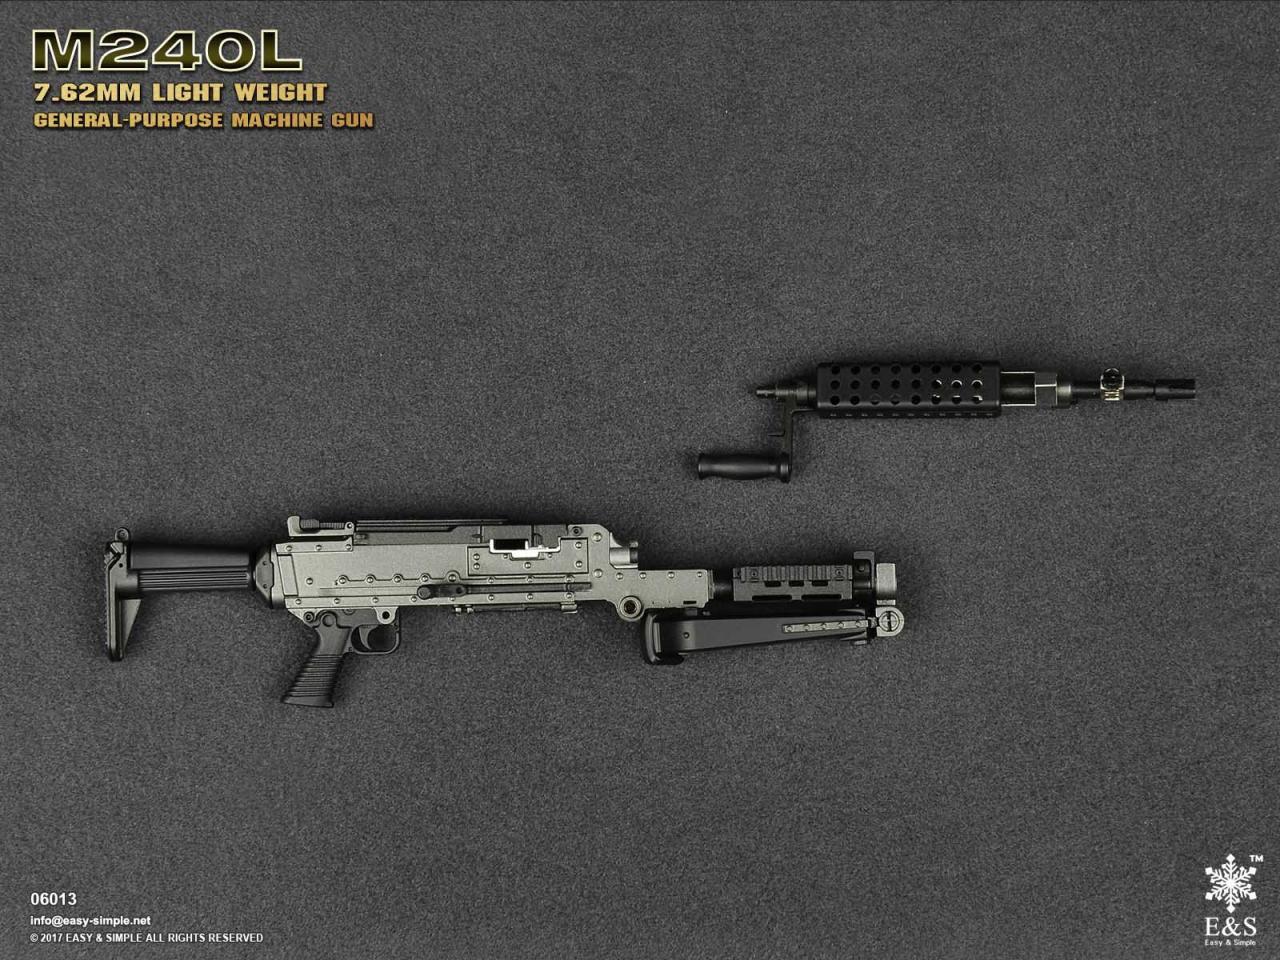 Easy&Simple 06013 M240L 7.62mm Light Weight General Purpose Machine Gun-06013-18-jpg